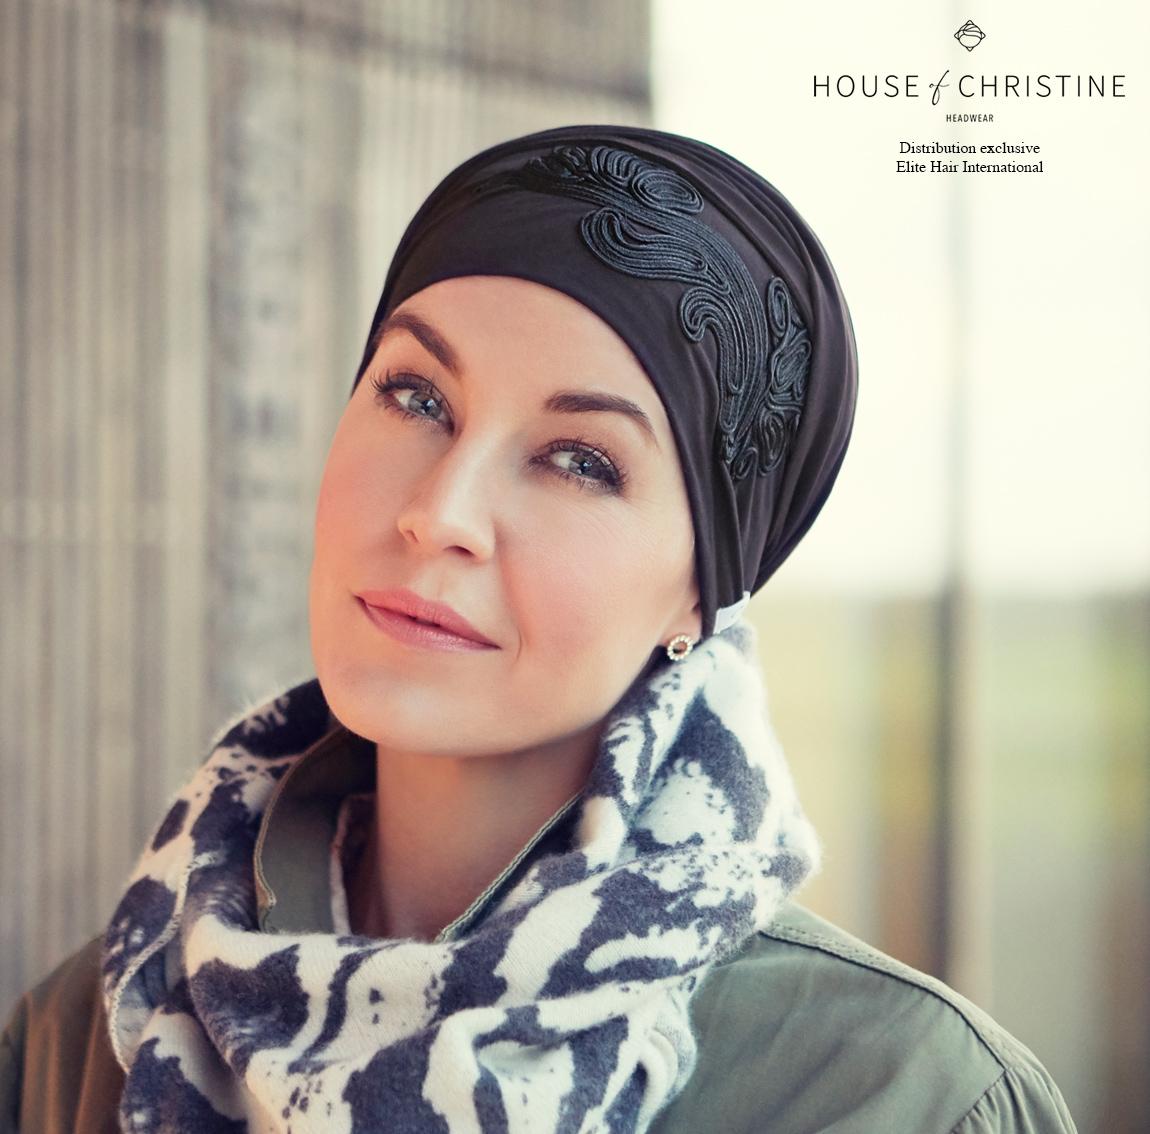 Bonnet chimio shazam, noir, christine headwear